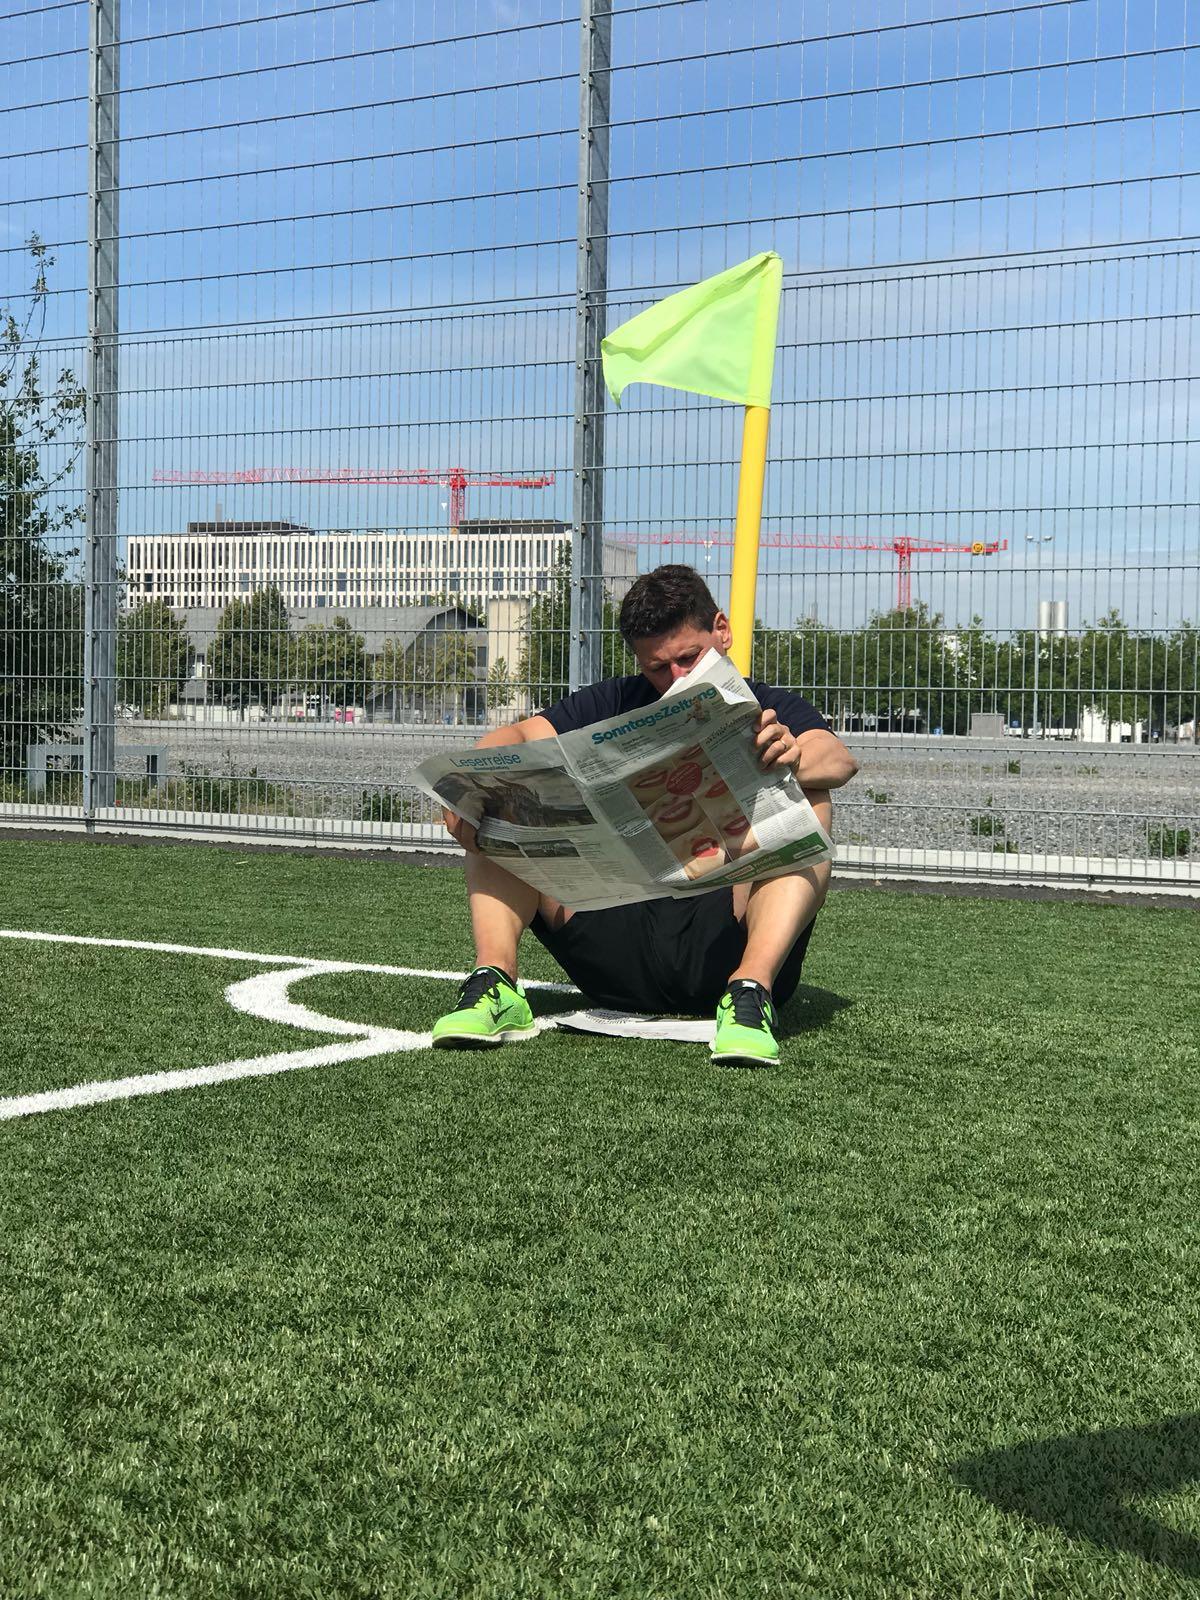 2018/06 Swiss Cup - Bern